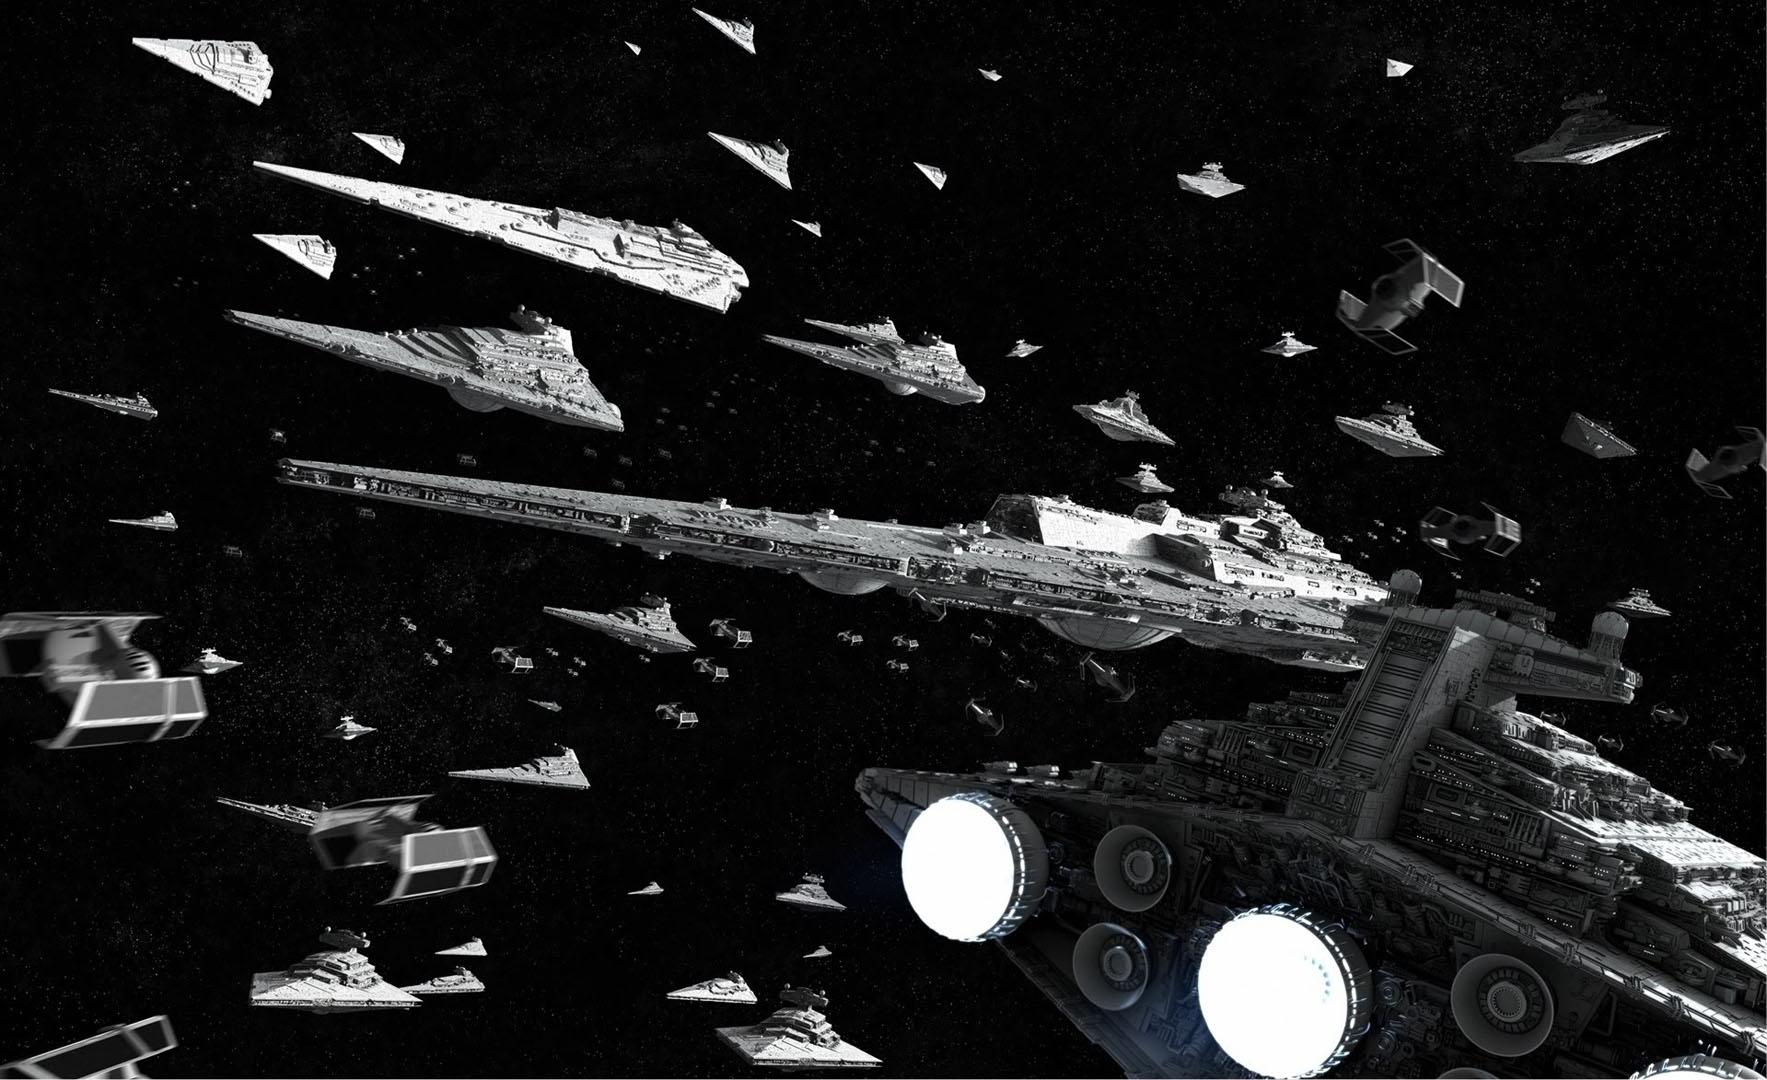 Beautiful Wallpaper Minecraft Simple - empire-spaceship-battle-fleet  Collection_25917.jpg